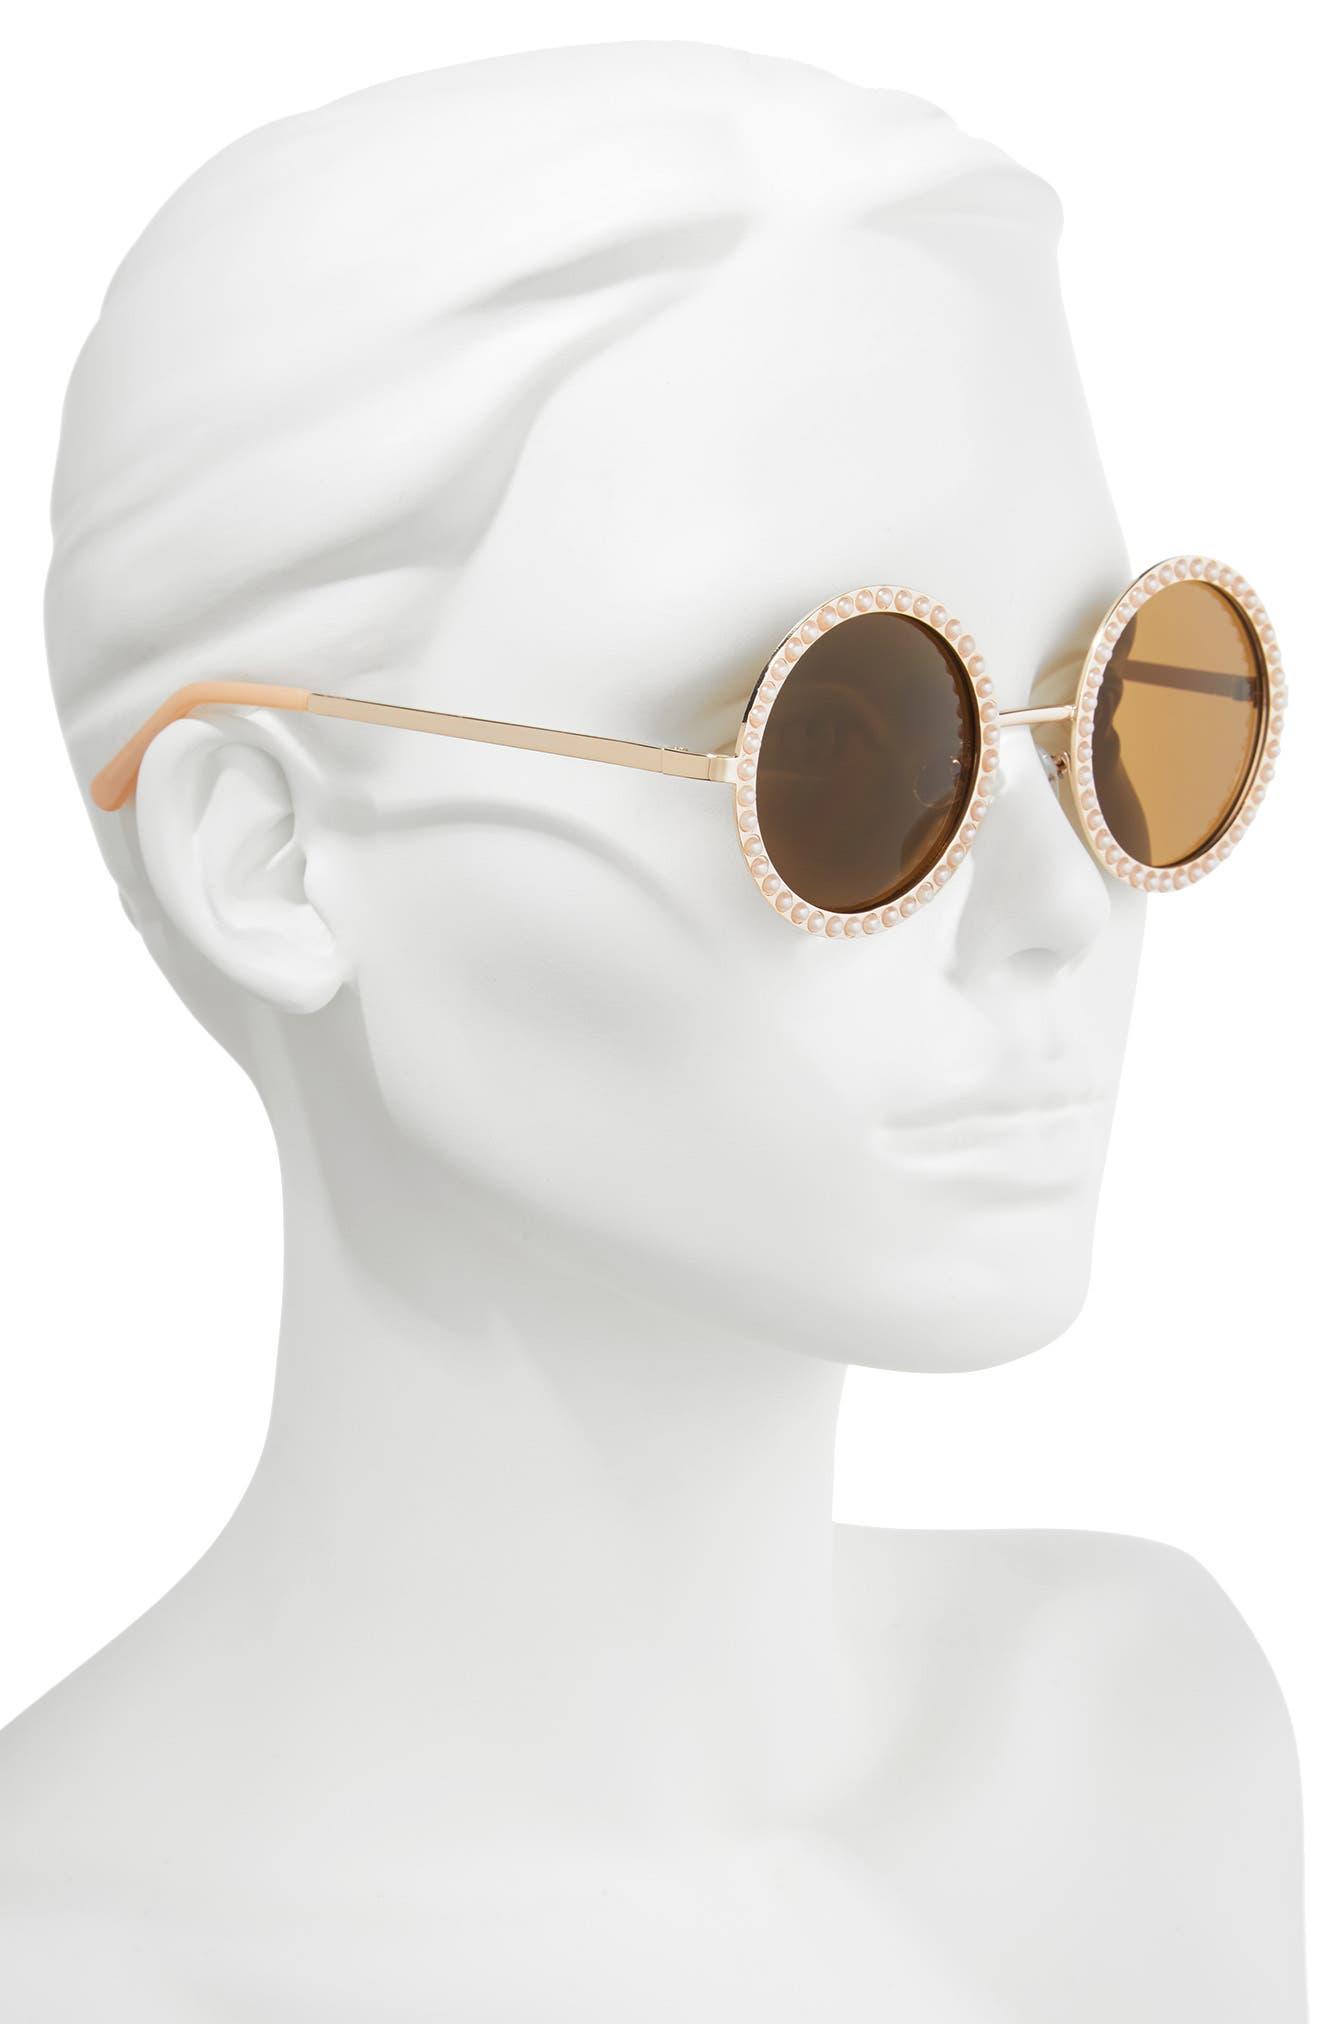 55mm Imitation Pearl Round Sunglasses,                             Alternate thumbnail 2, color,                             710